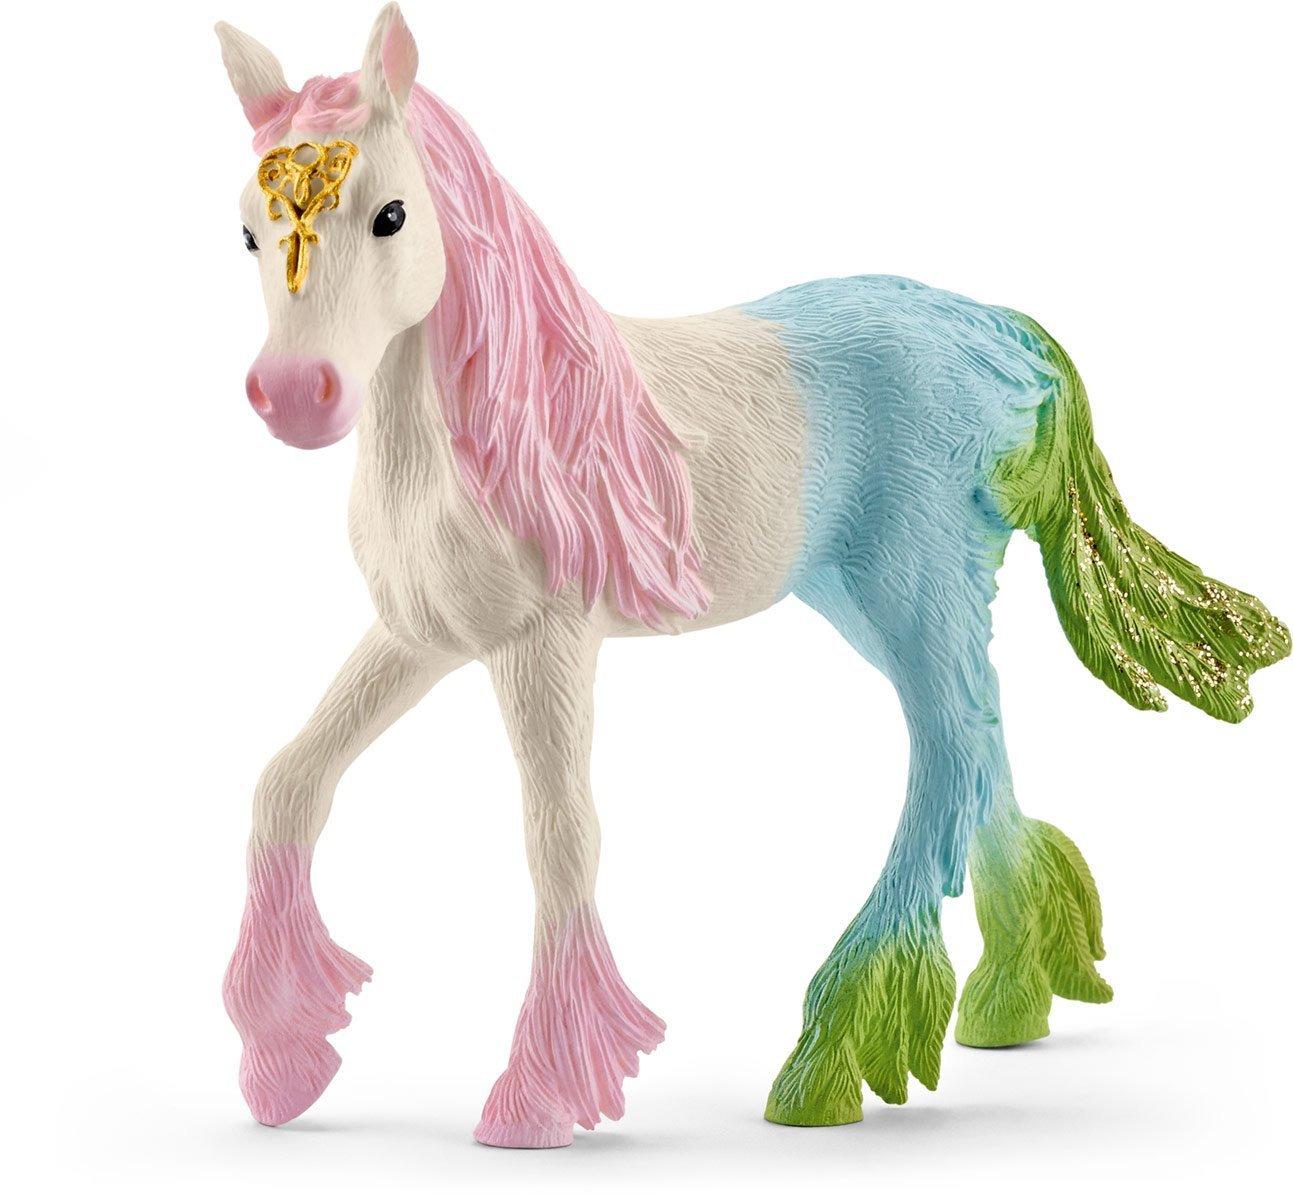 Schleich Фигурка Эльфийский разноцветный жеребенок